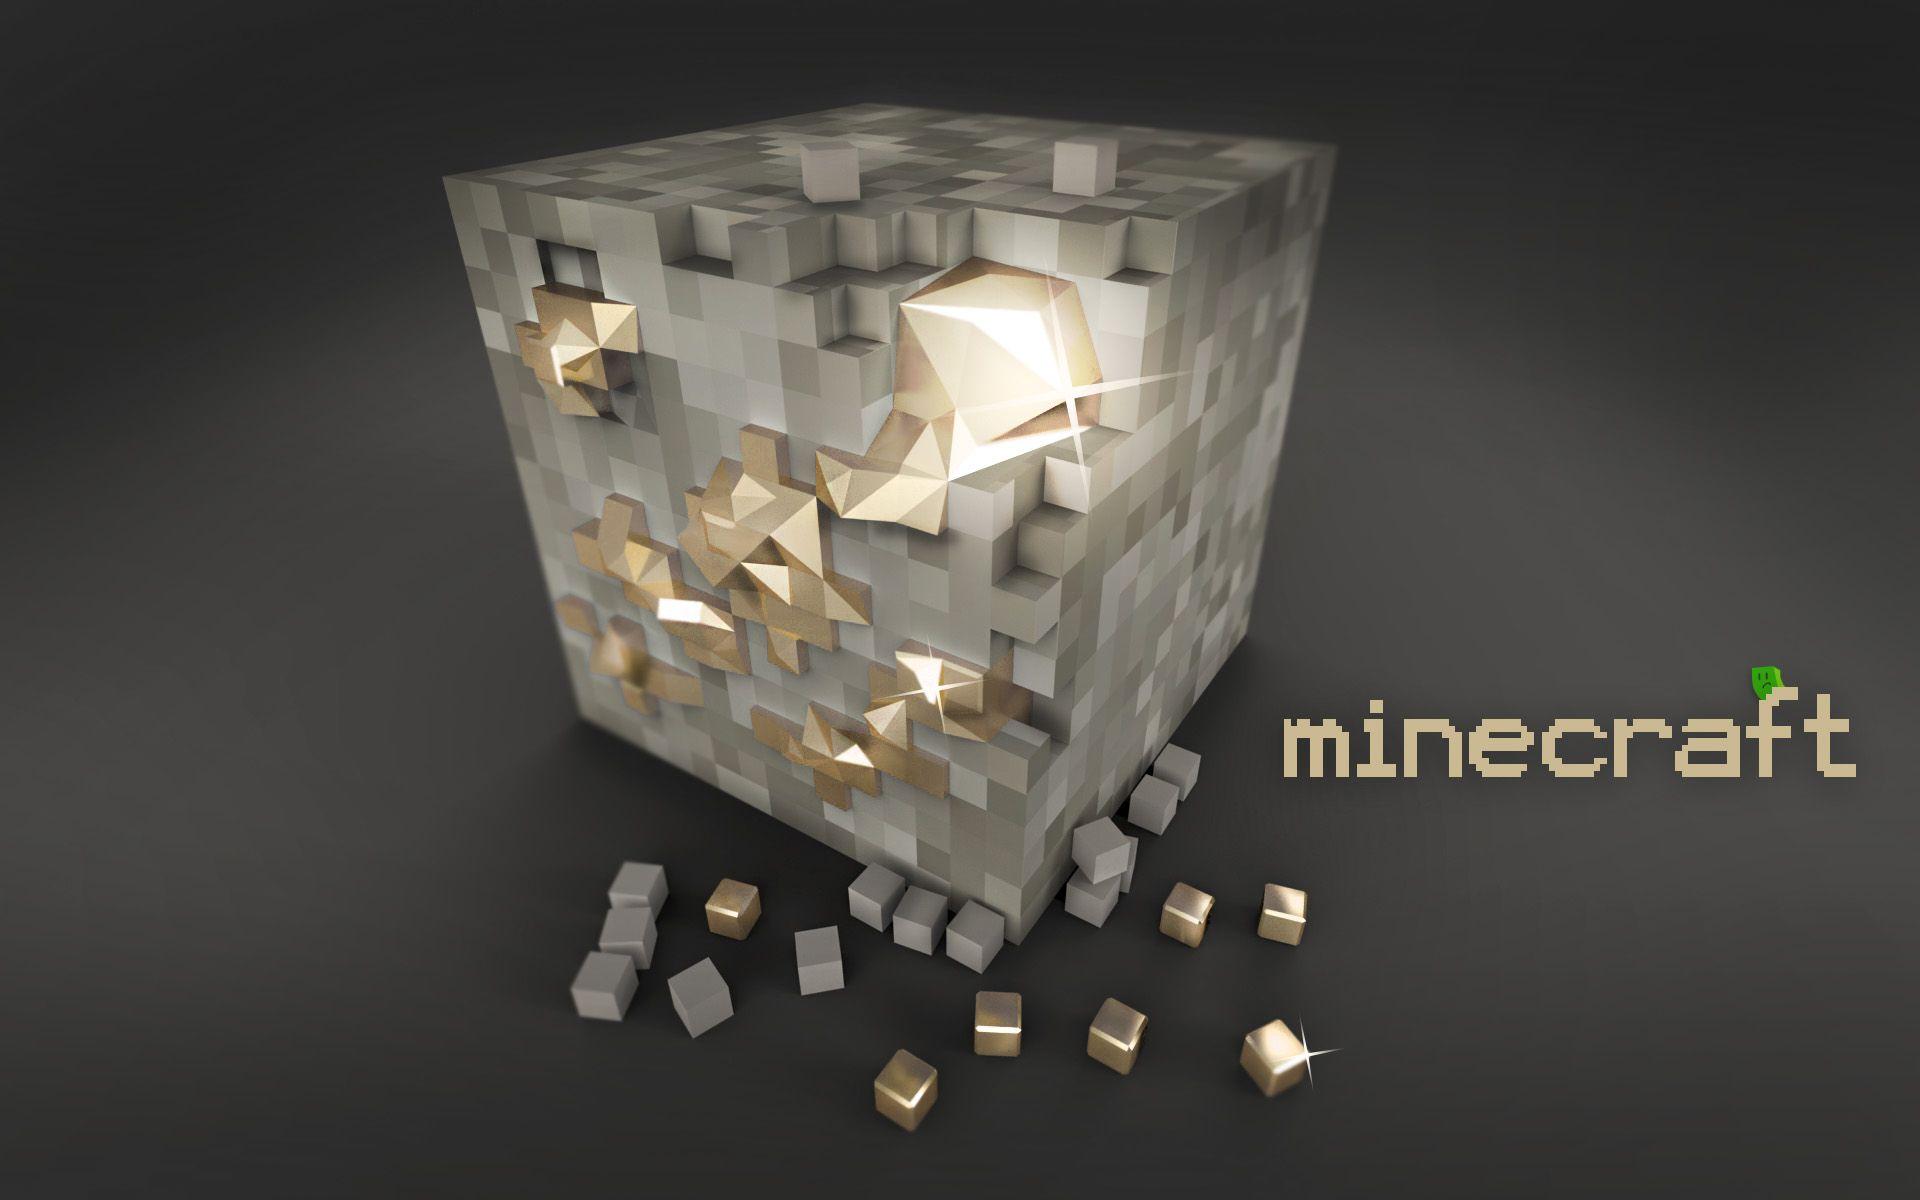 3d Minecraft Diamond Block Wallpaper Minecraft Imágenes